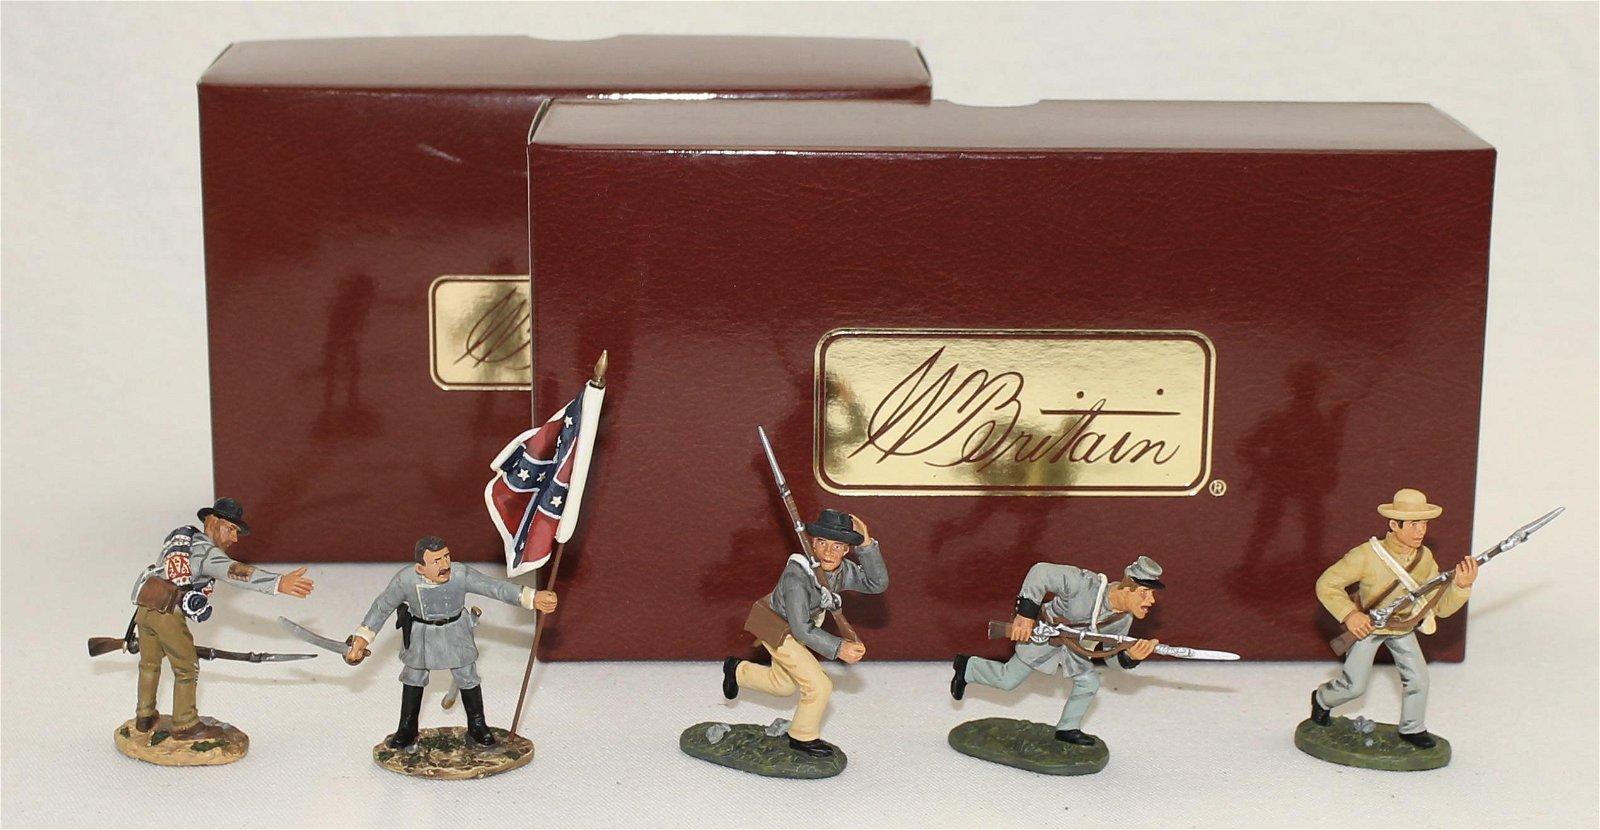 Britains Lot 26th North Carolina Regiment